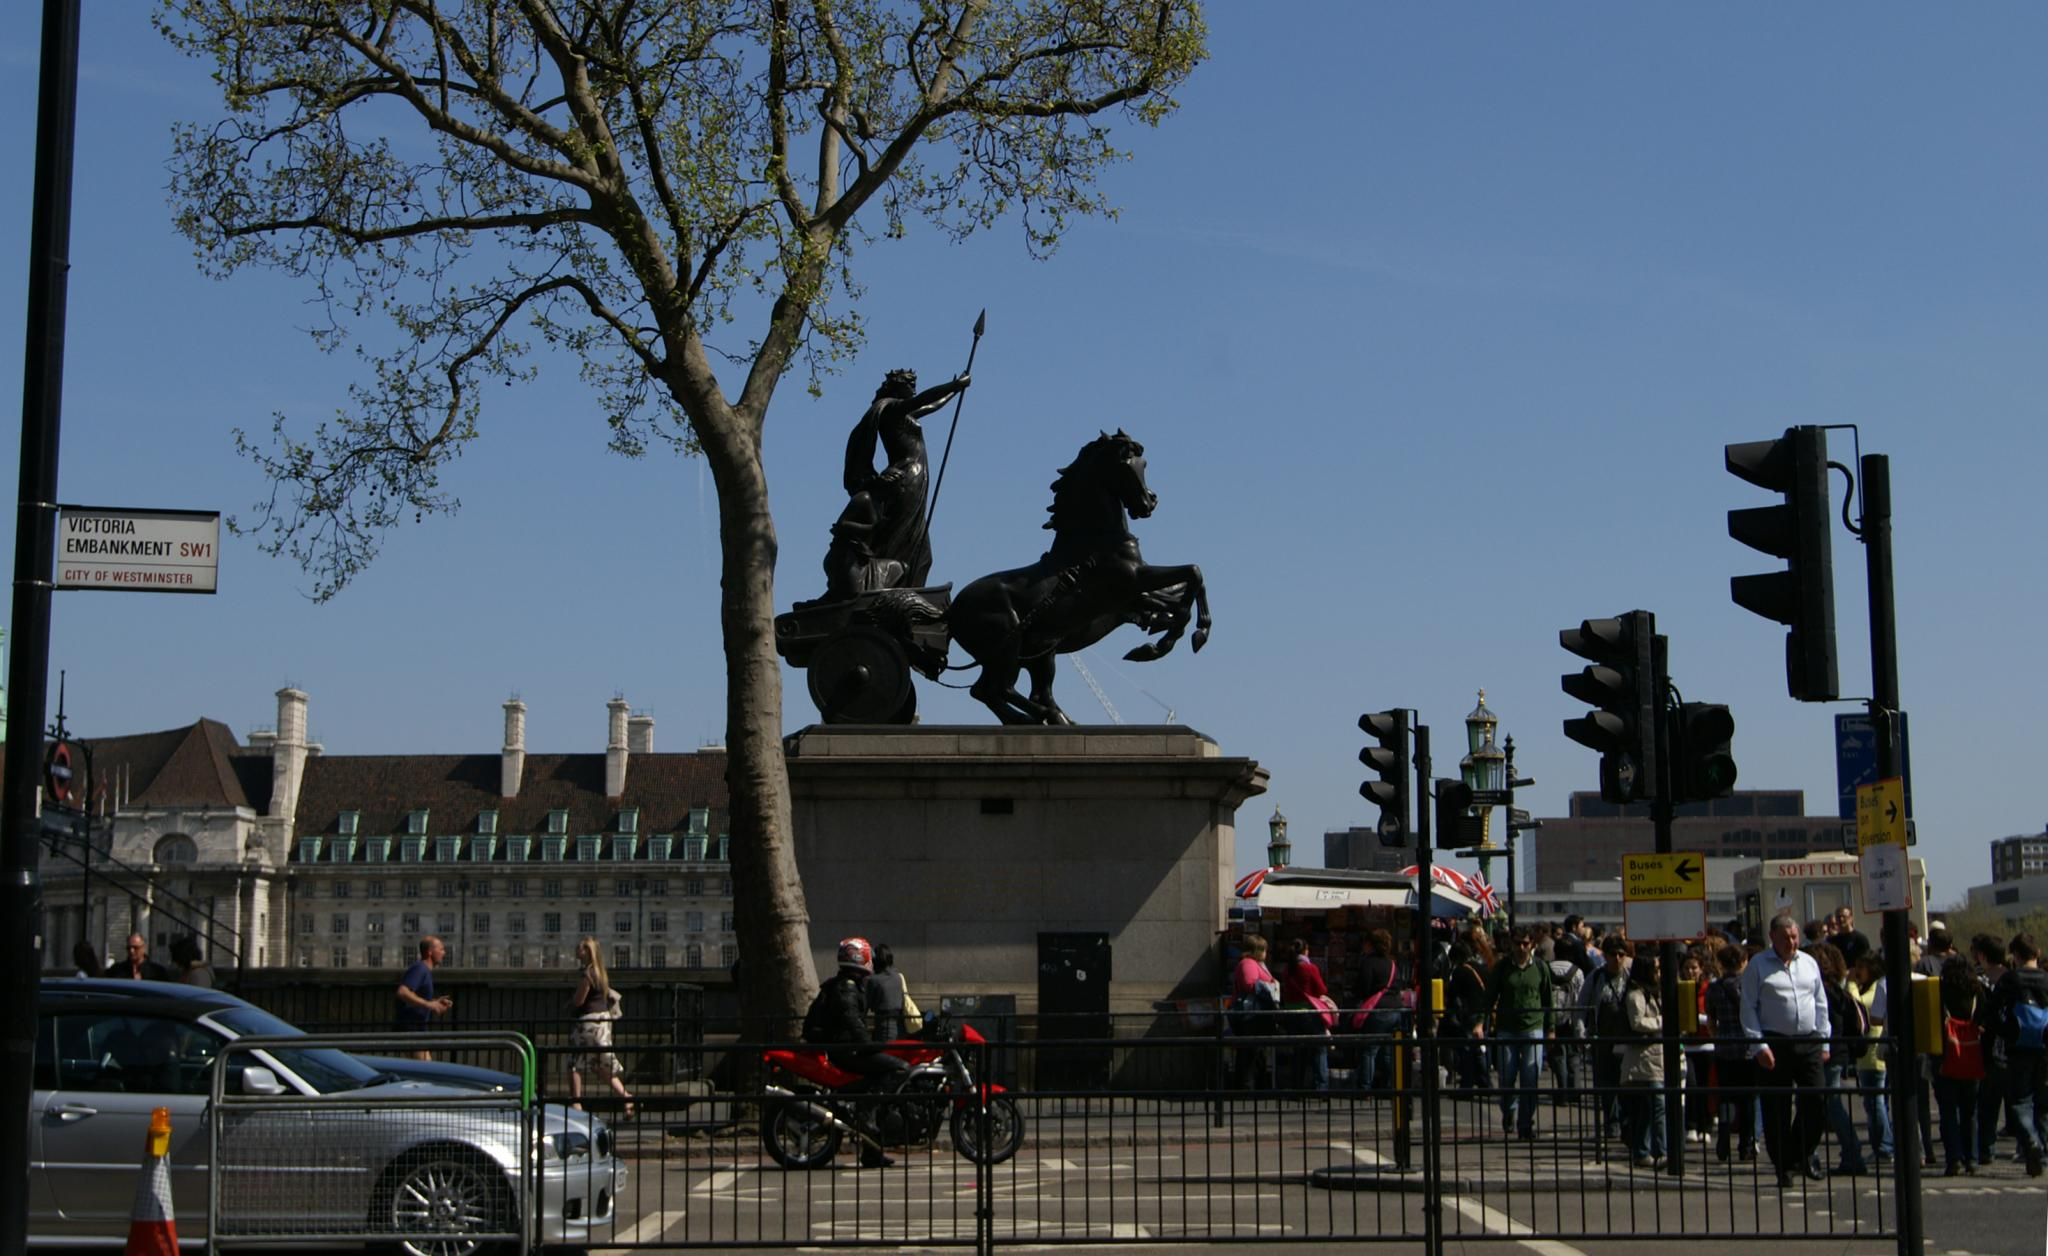 https://i0.wp.com/upload.wikimedia.org/wikipedia/commons/e/e6/Statue_of_Boudicca.jpg